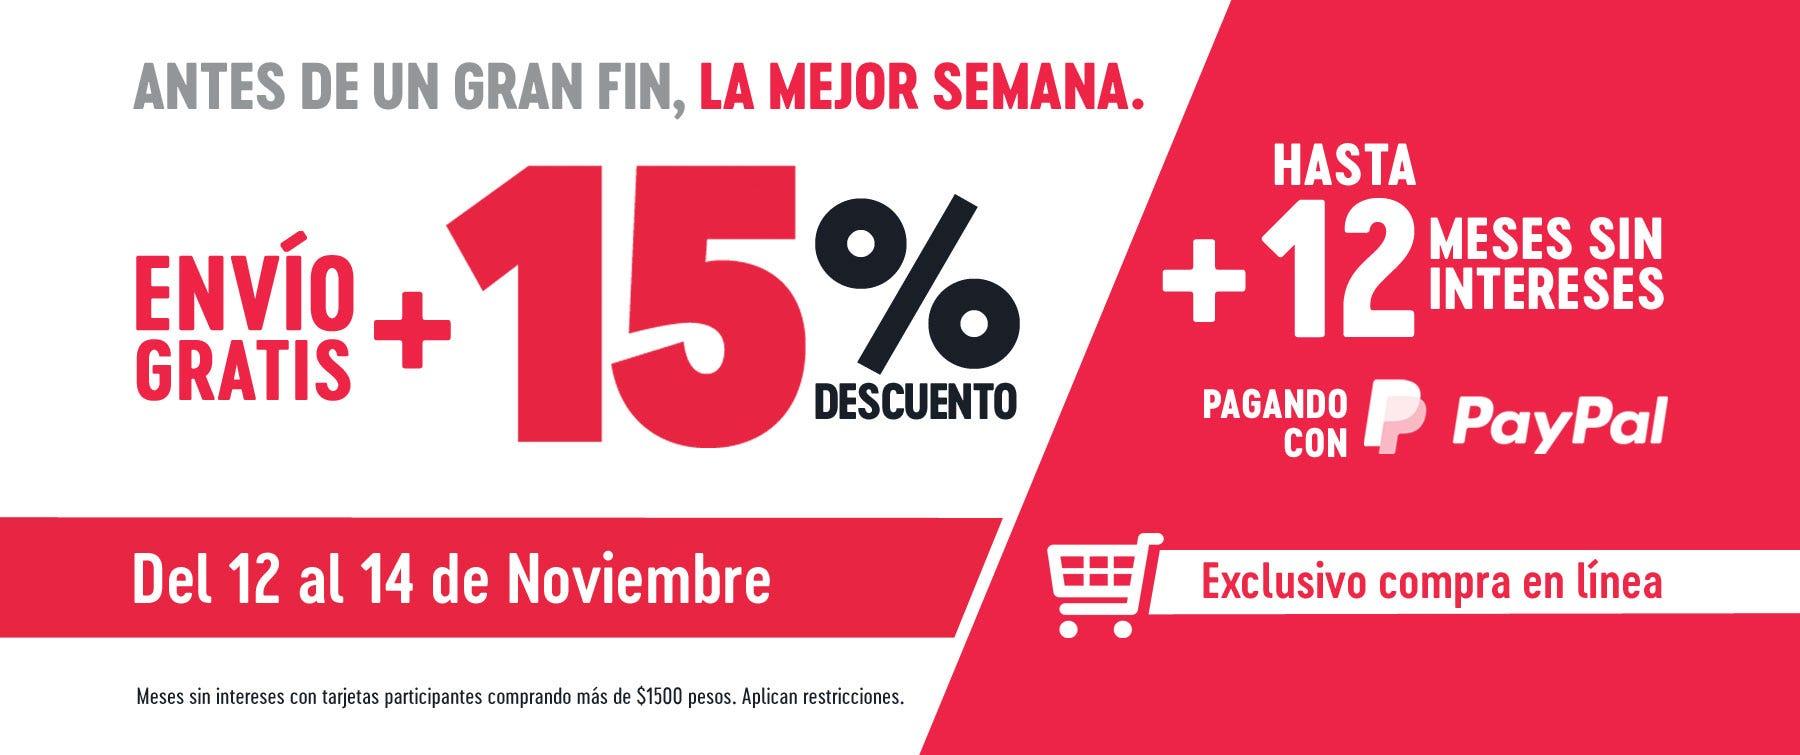 GNC en línea: ENVIO GRATIS + 15% DE DESC + 12 MSI con Paypal